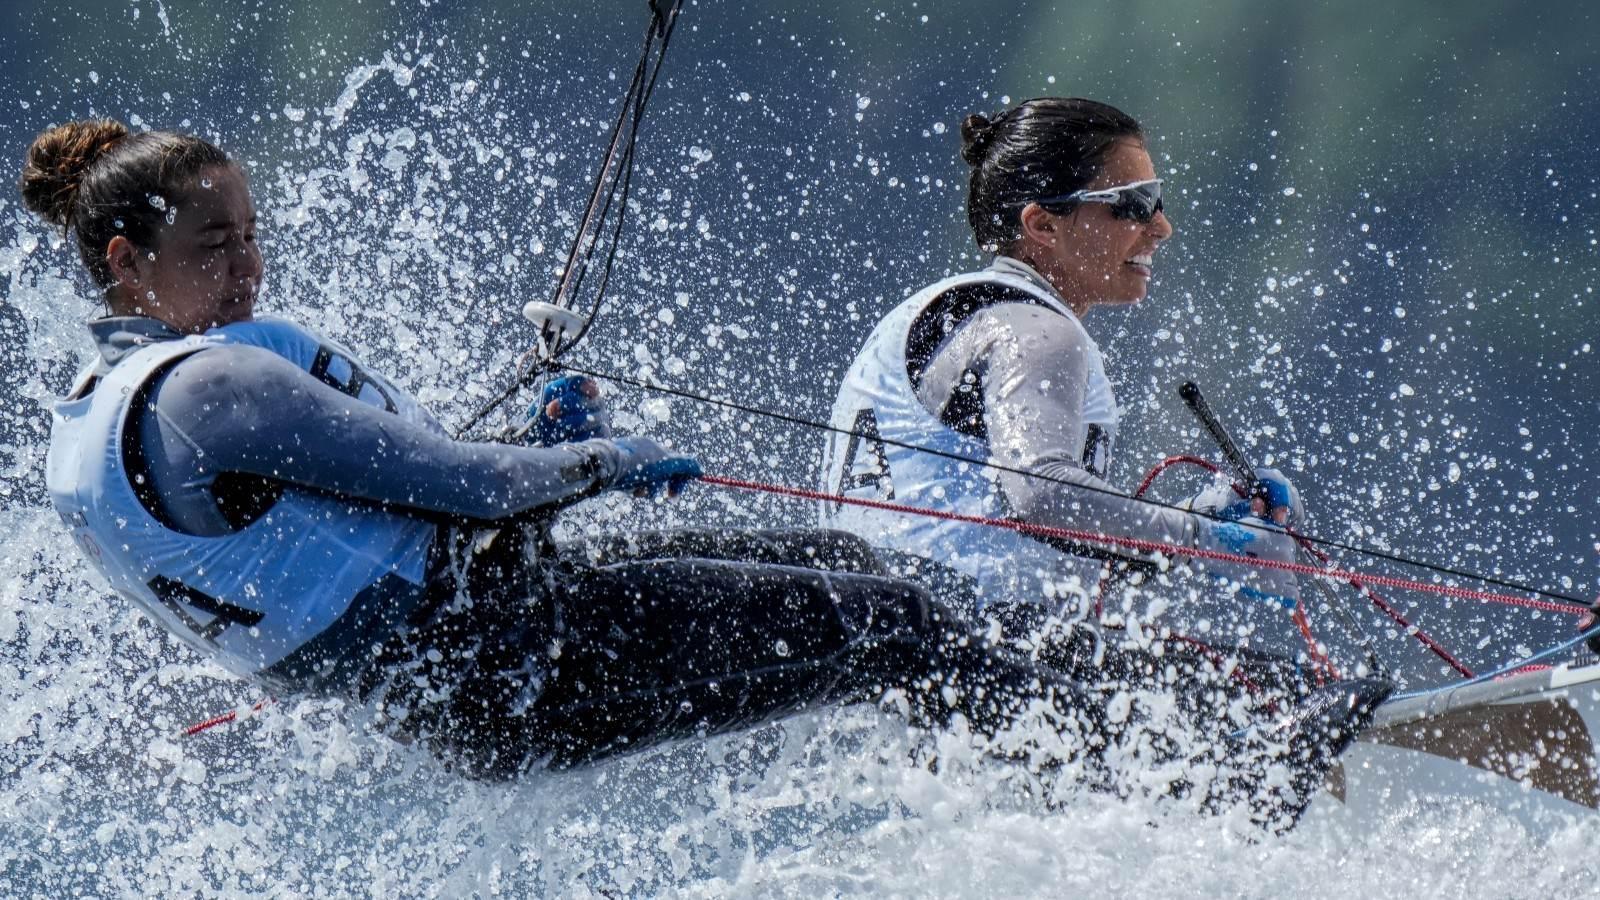 Fernanda Oliveira e Ana Luiza Barbachan competem em etapa da classe 470